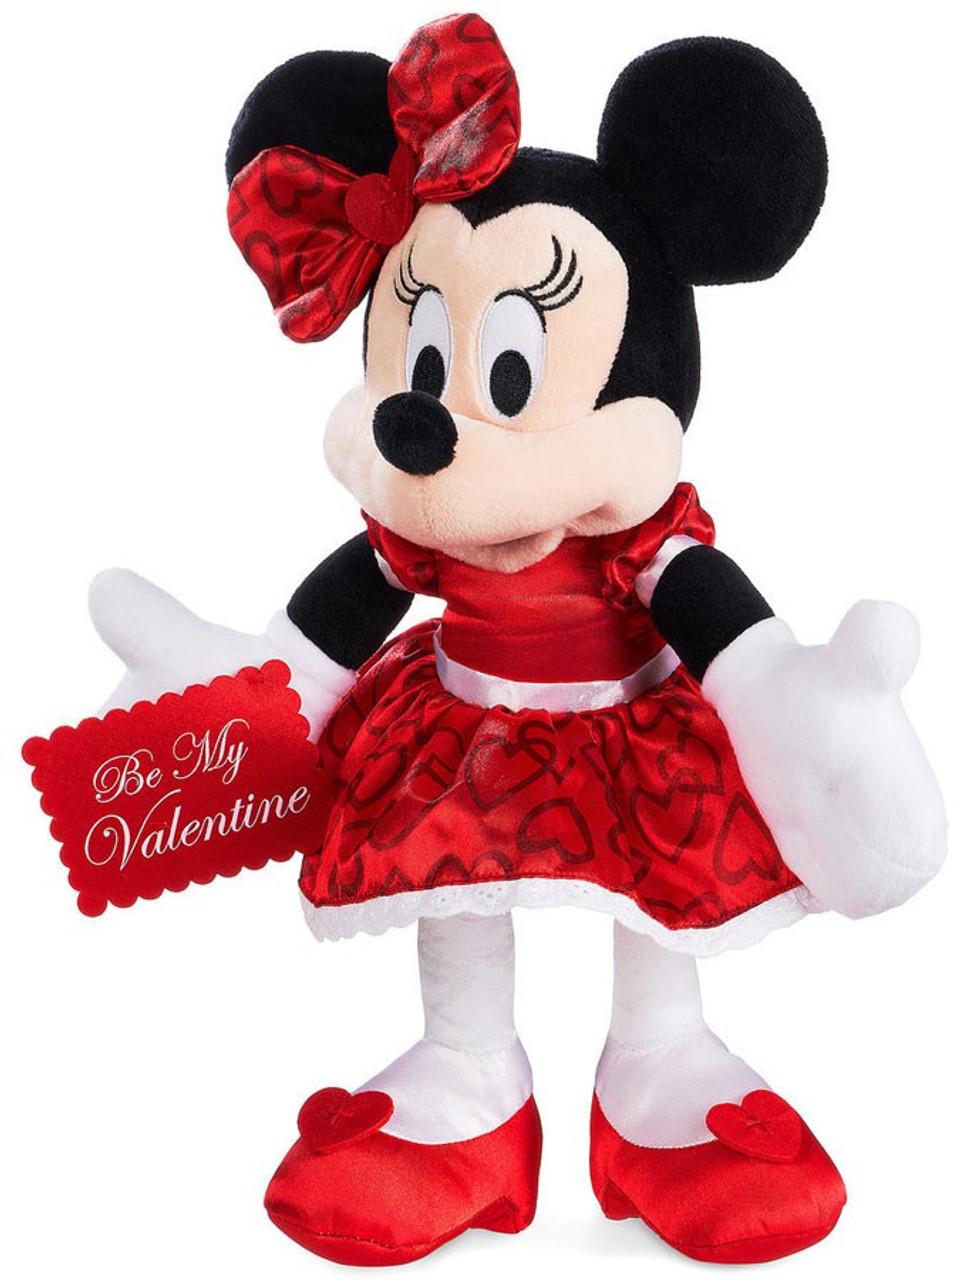 Disney 2018 Valentines Day Minnie Mouse Exclusive 13 Plush Toywiz